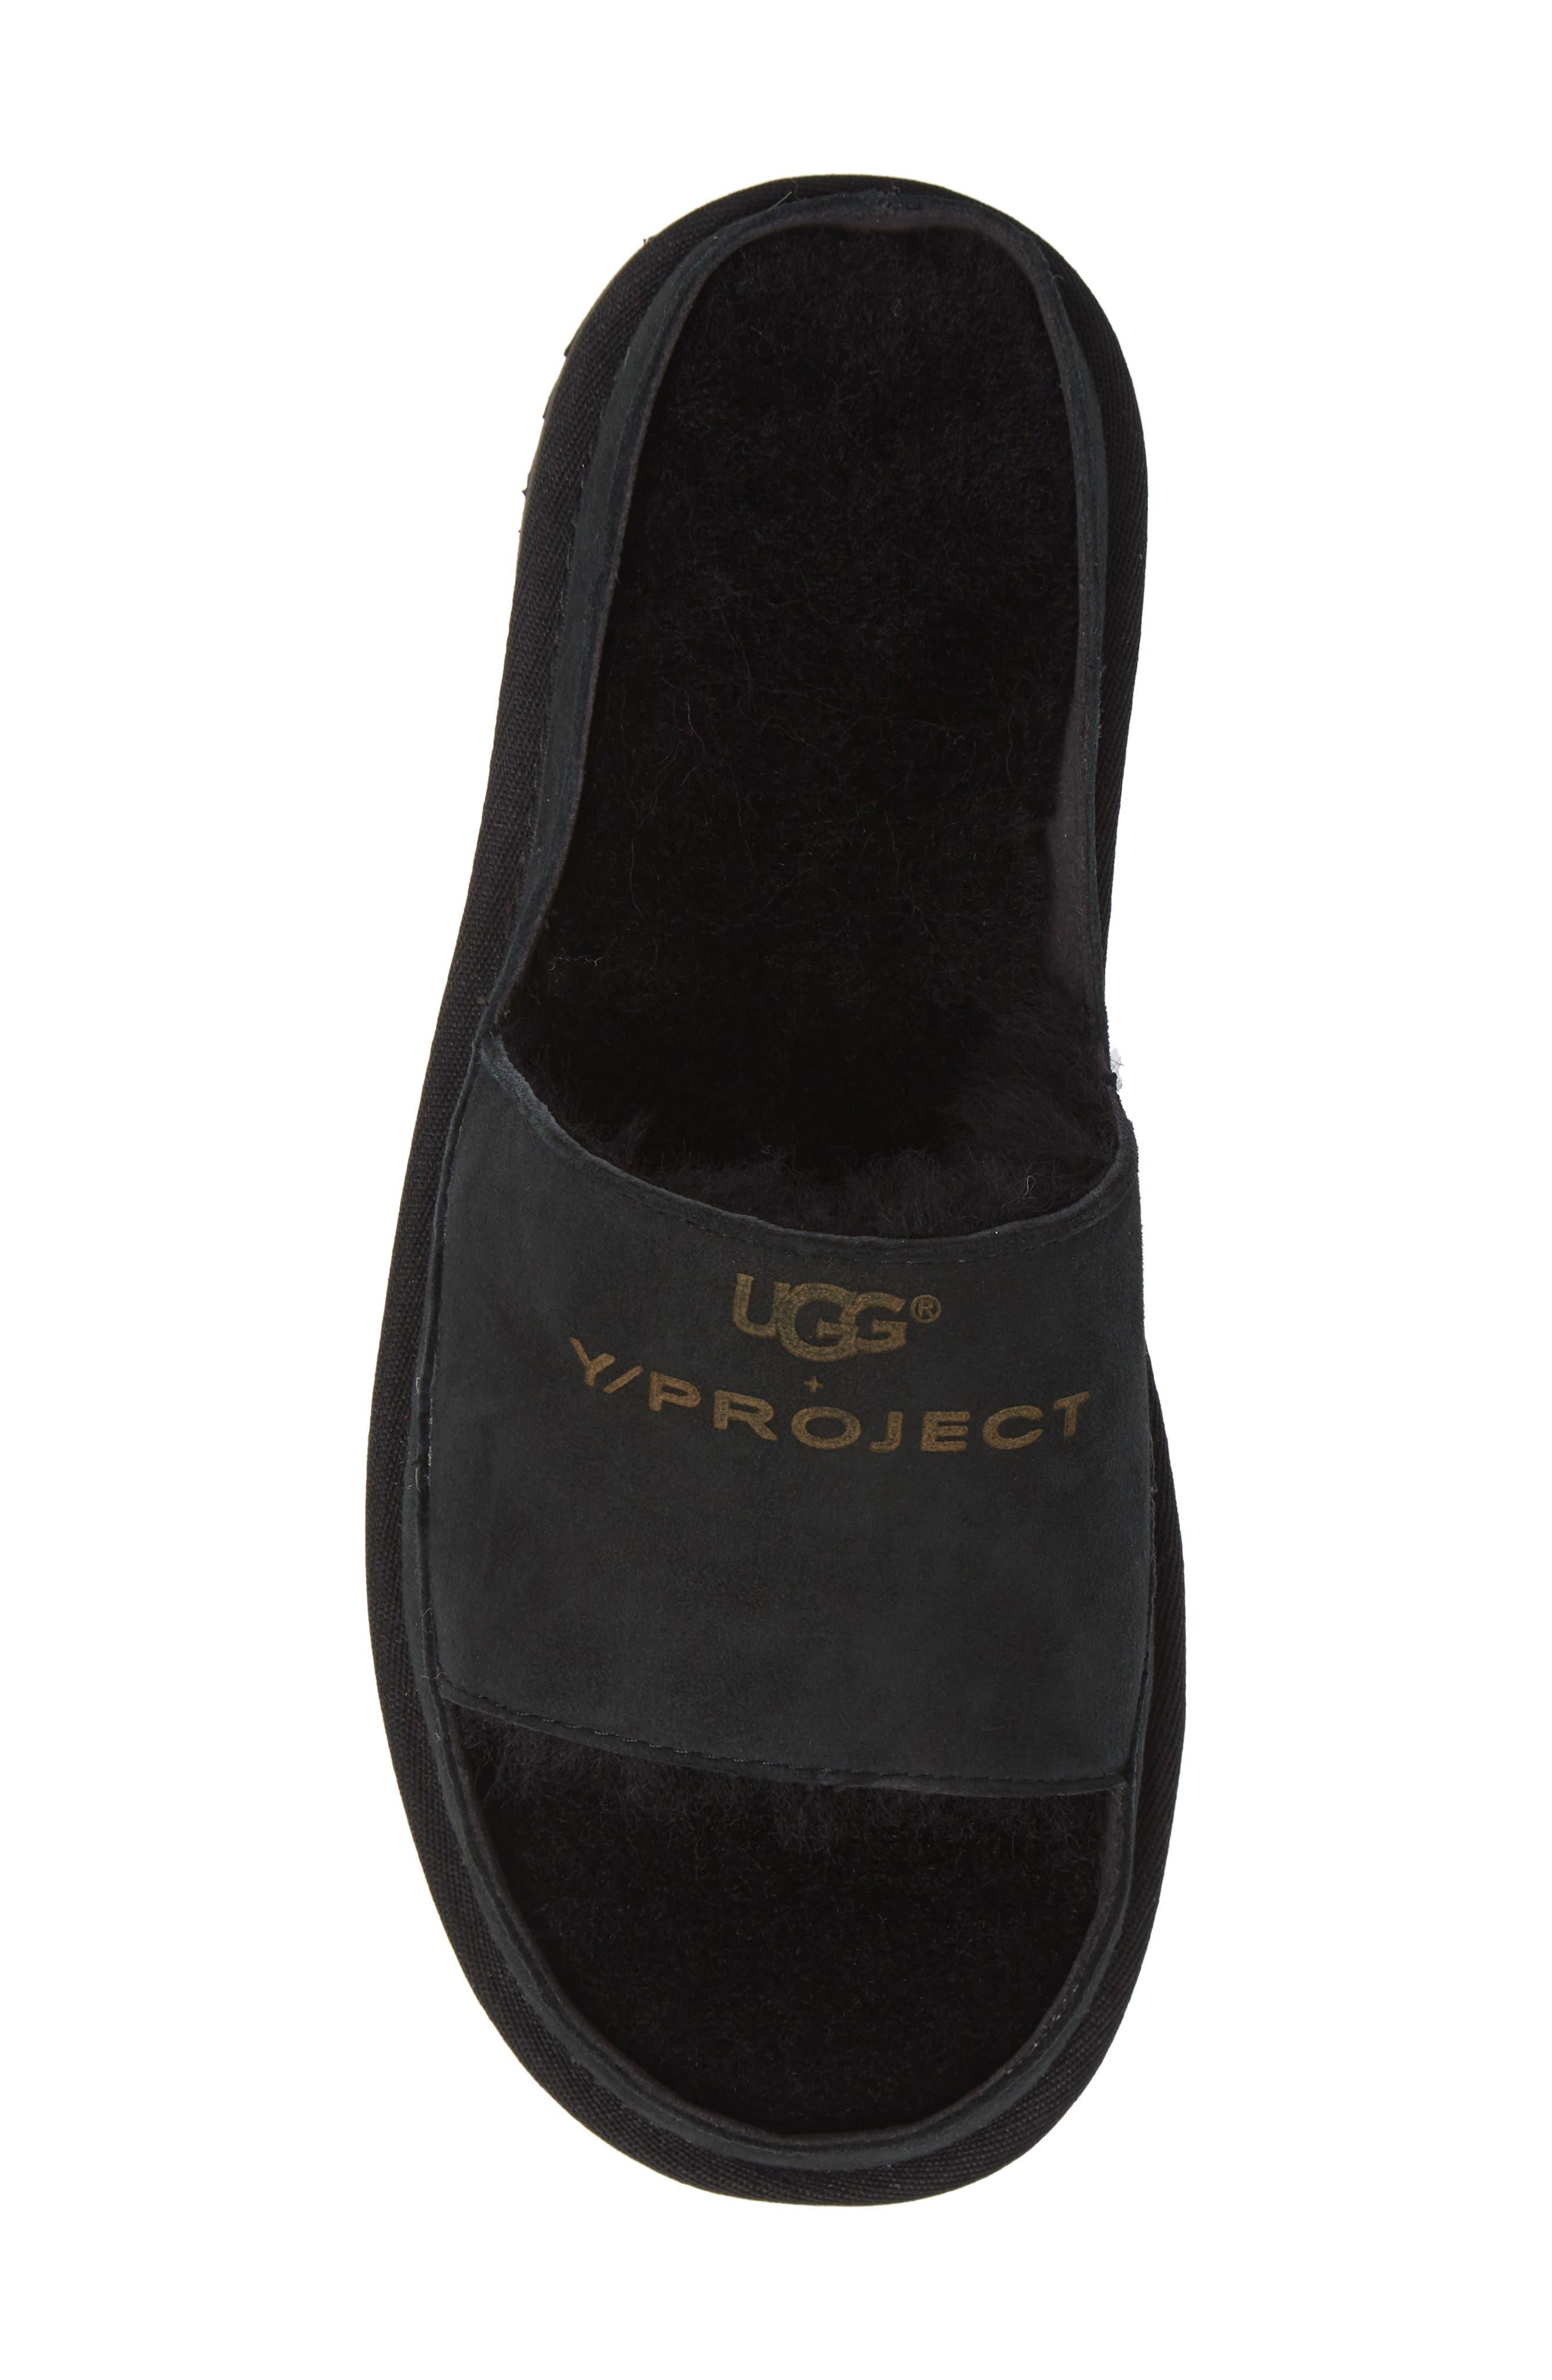 x UGG<sup>®</sup> Genuine Shearling Slide Sandal,                             Alternate thumbnail 5, color,                             001